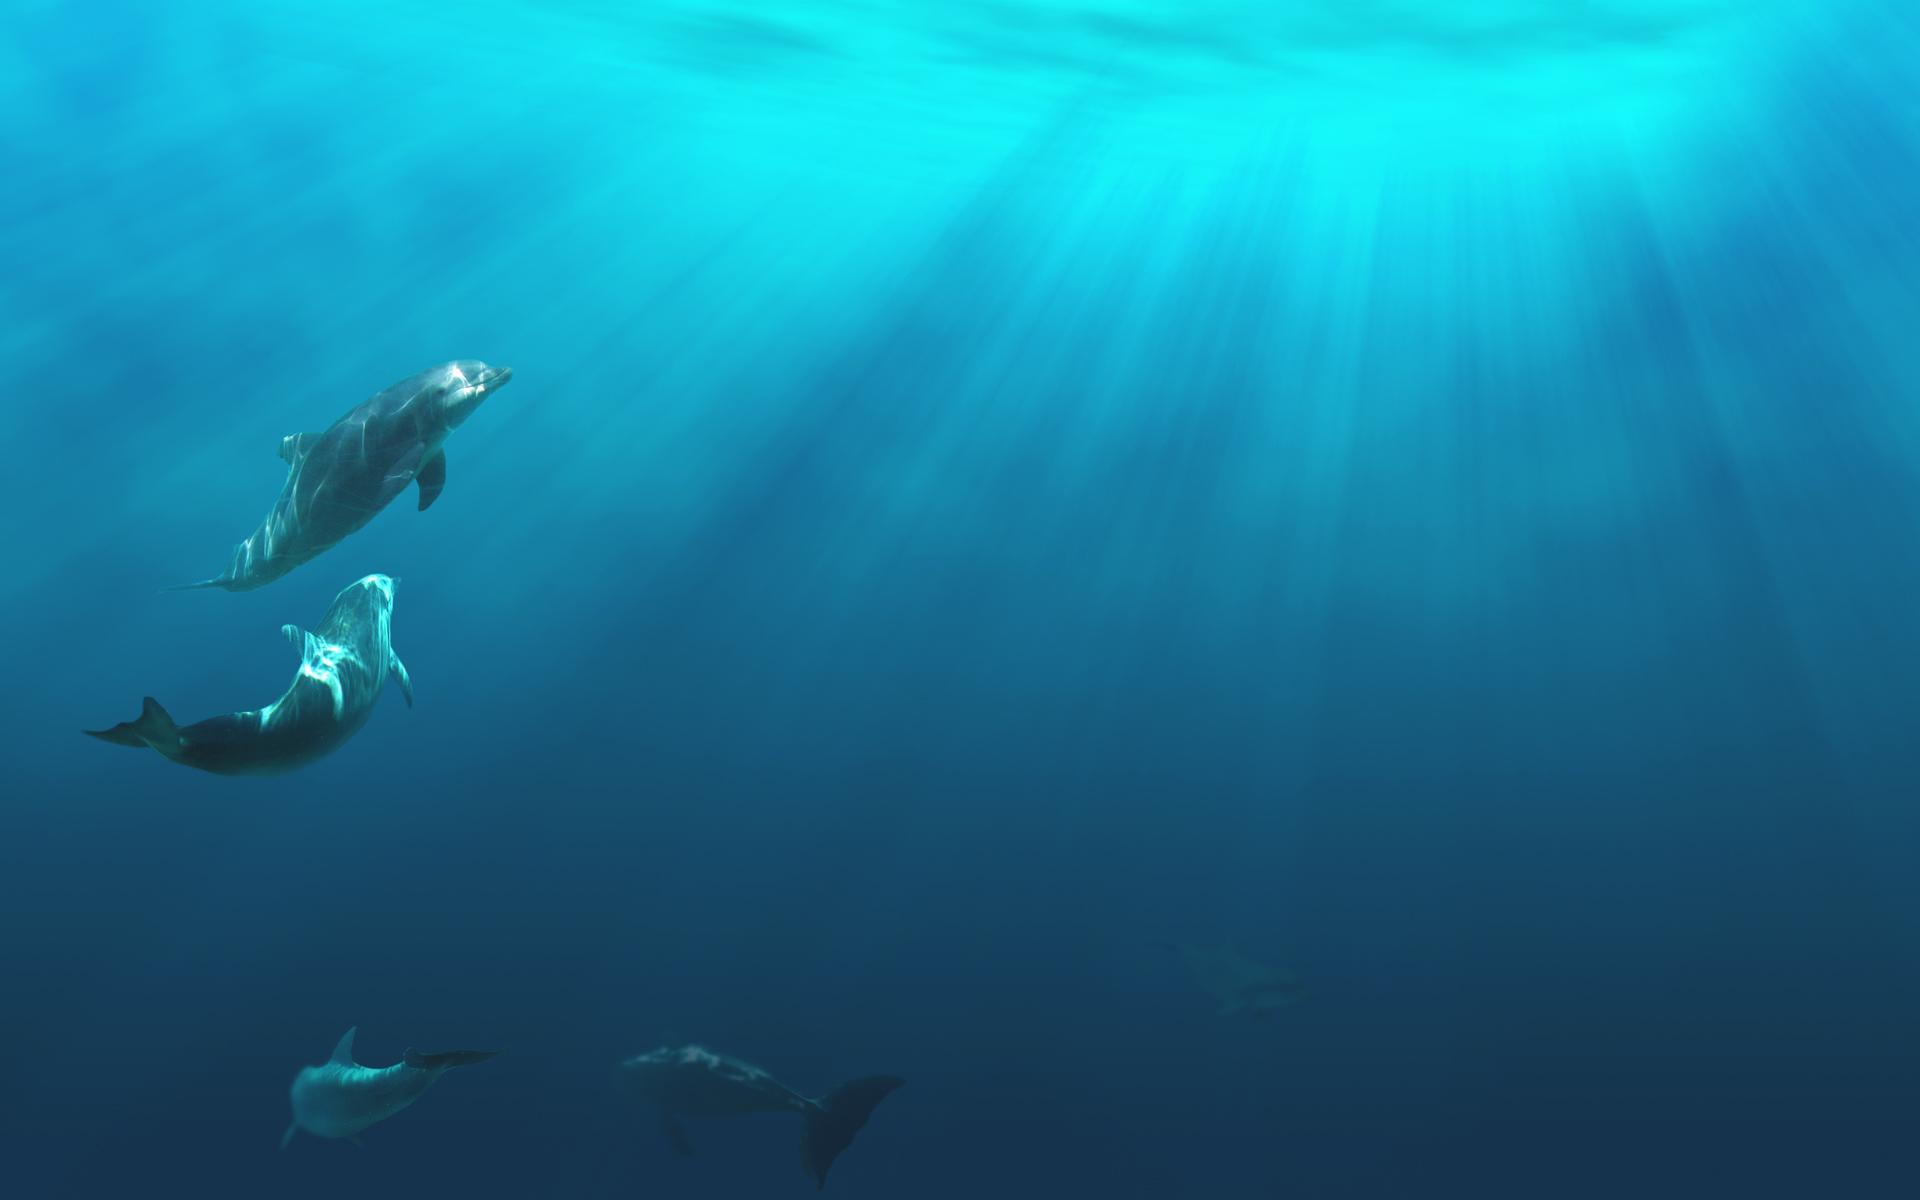 best-underwater-hd-wallpapersFABF45AC-83BD-0C28-5289-5CCB8791041A.jpg